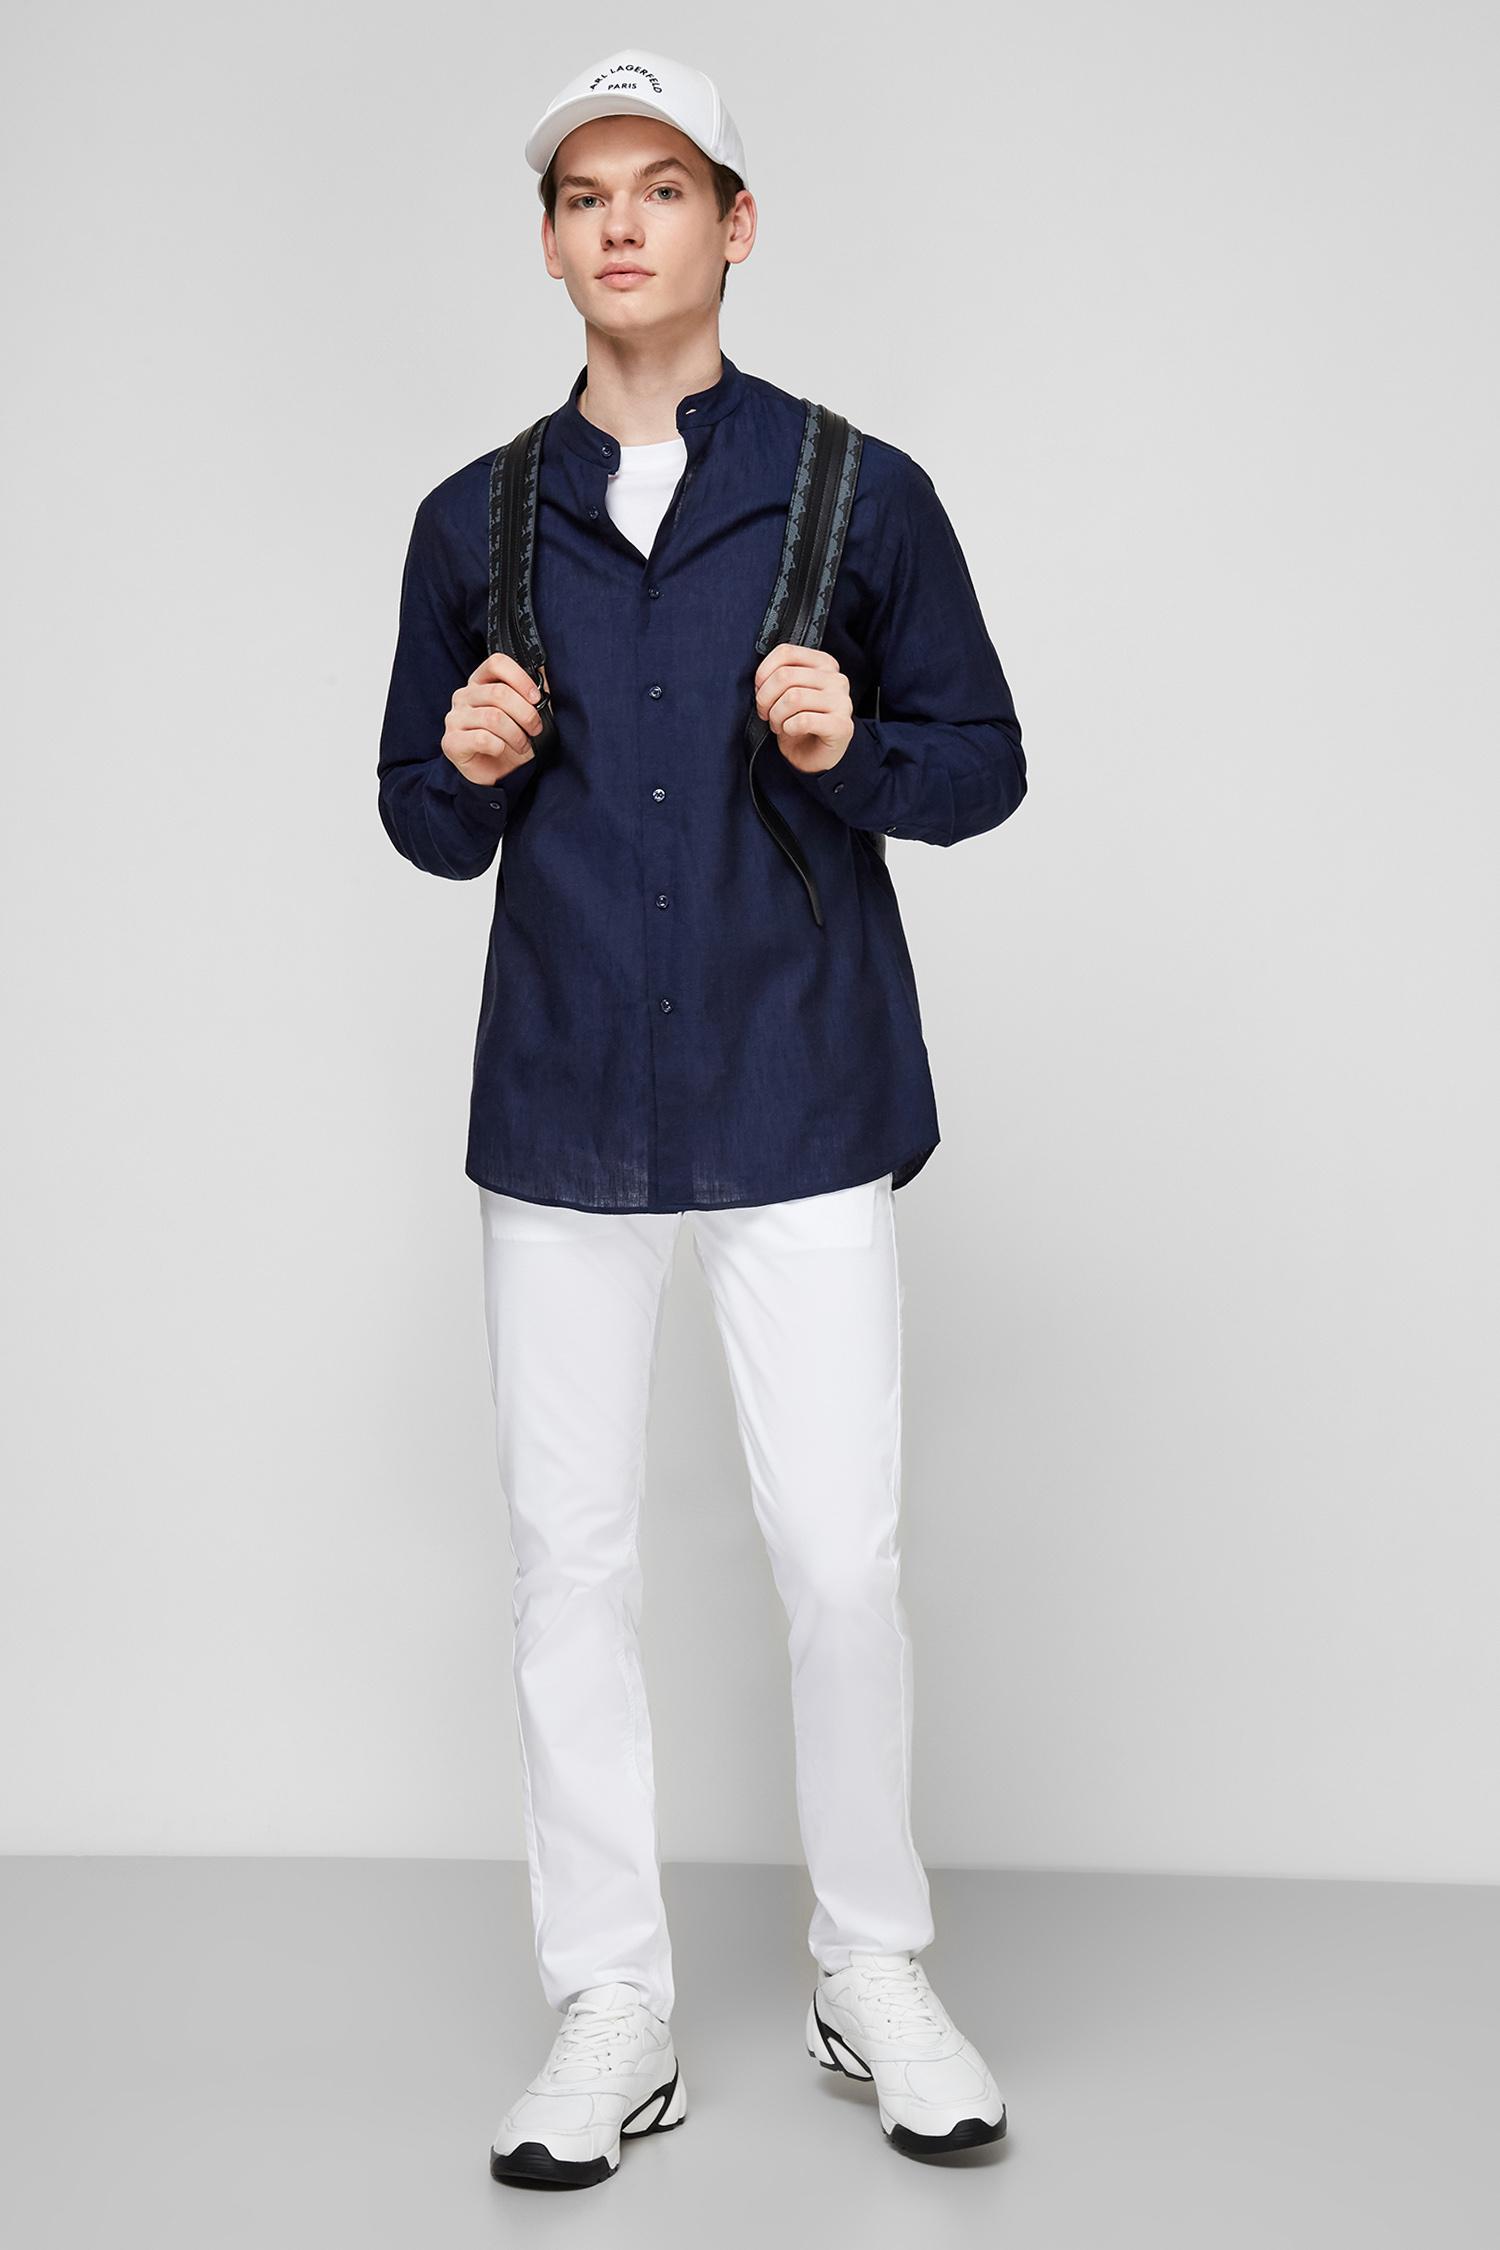 Темно-синяя льняная рубашка для парней Karl Lagerfeld 511628.605035;690